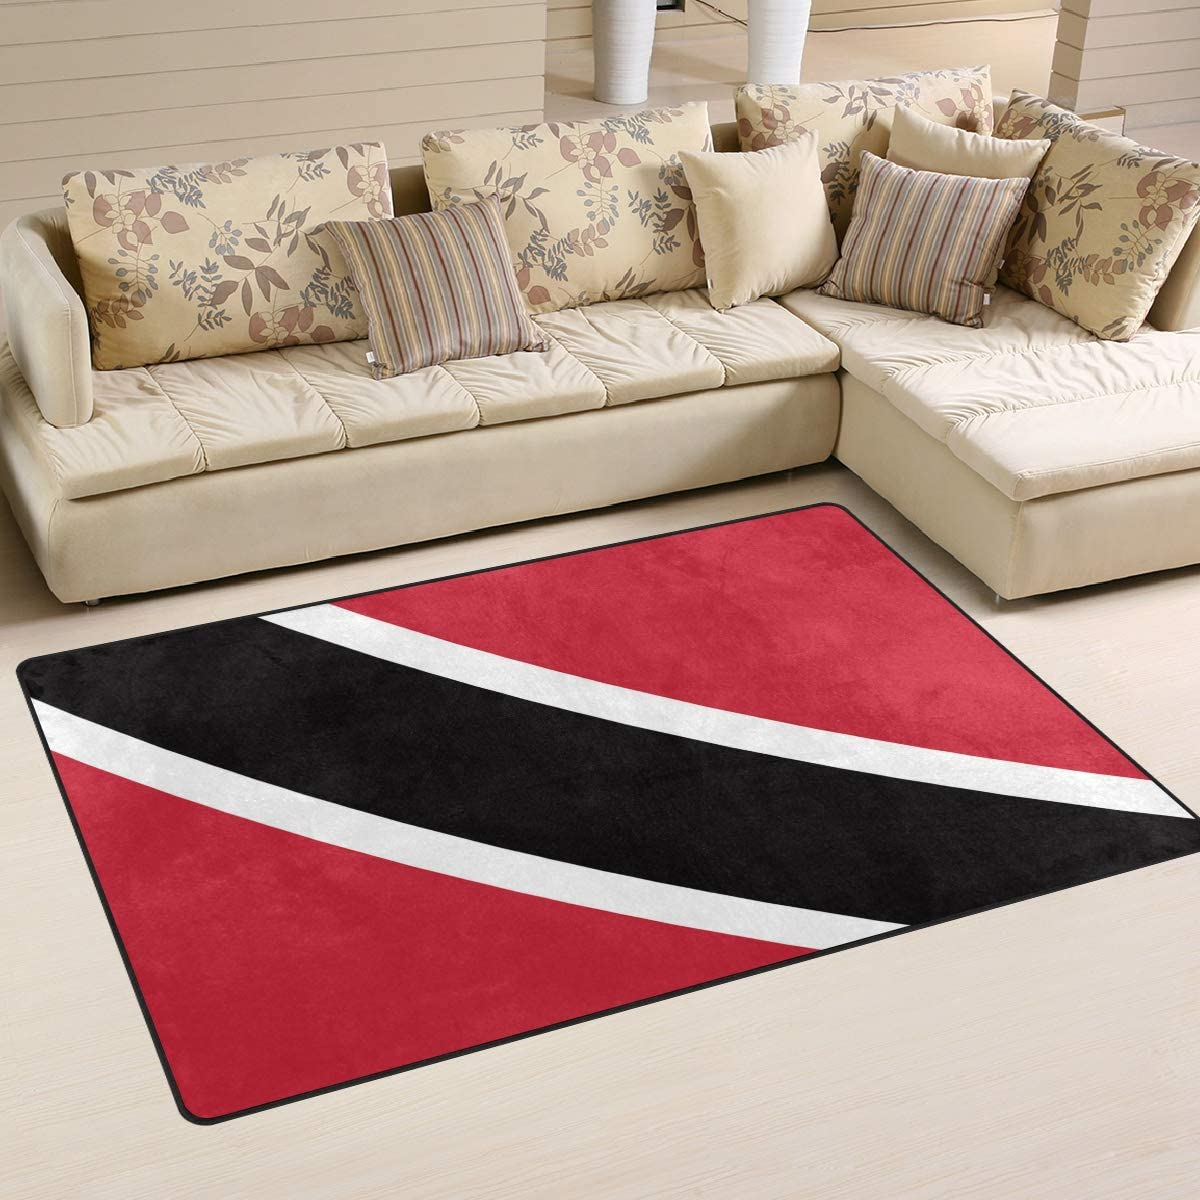 Ainans Flag of Trinidad and Minneapolis Mall Tobago Floo Area Carpet Max 49% OFF Non-Slip Rug